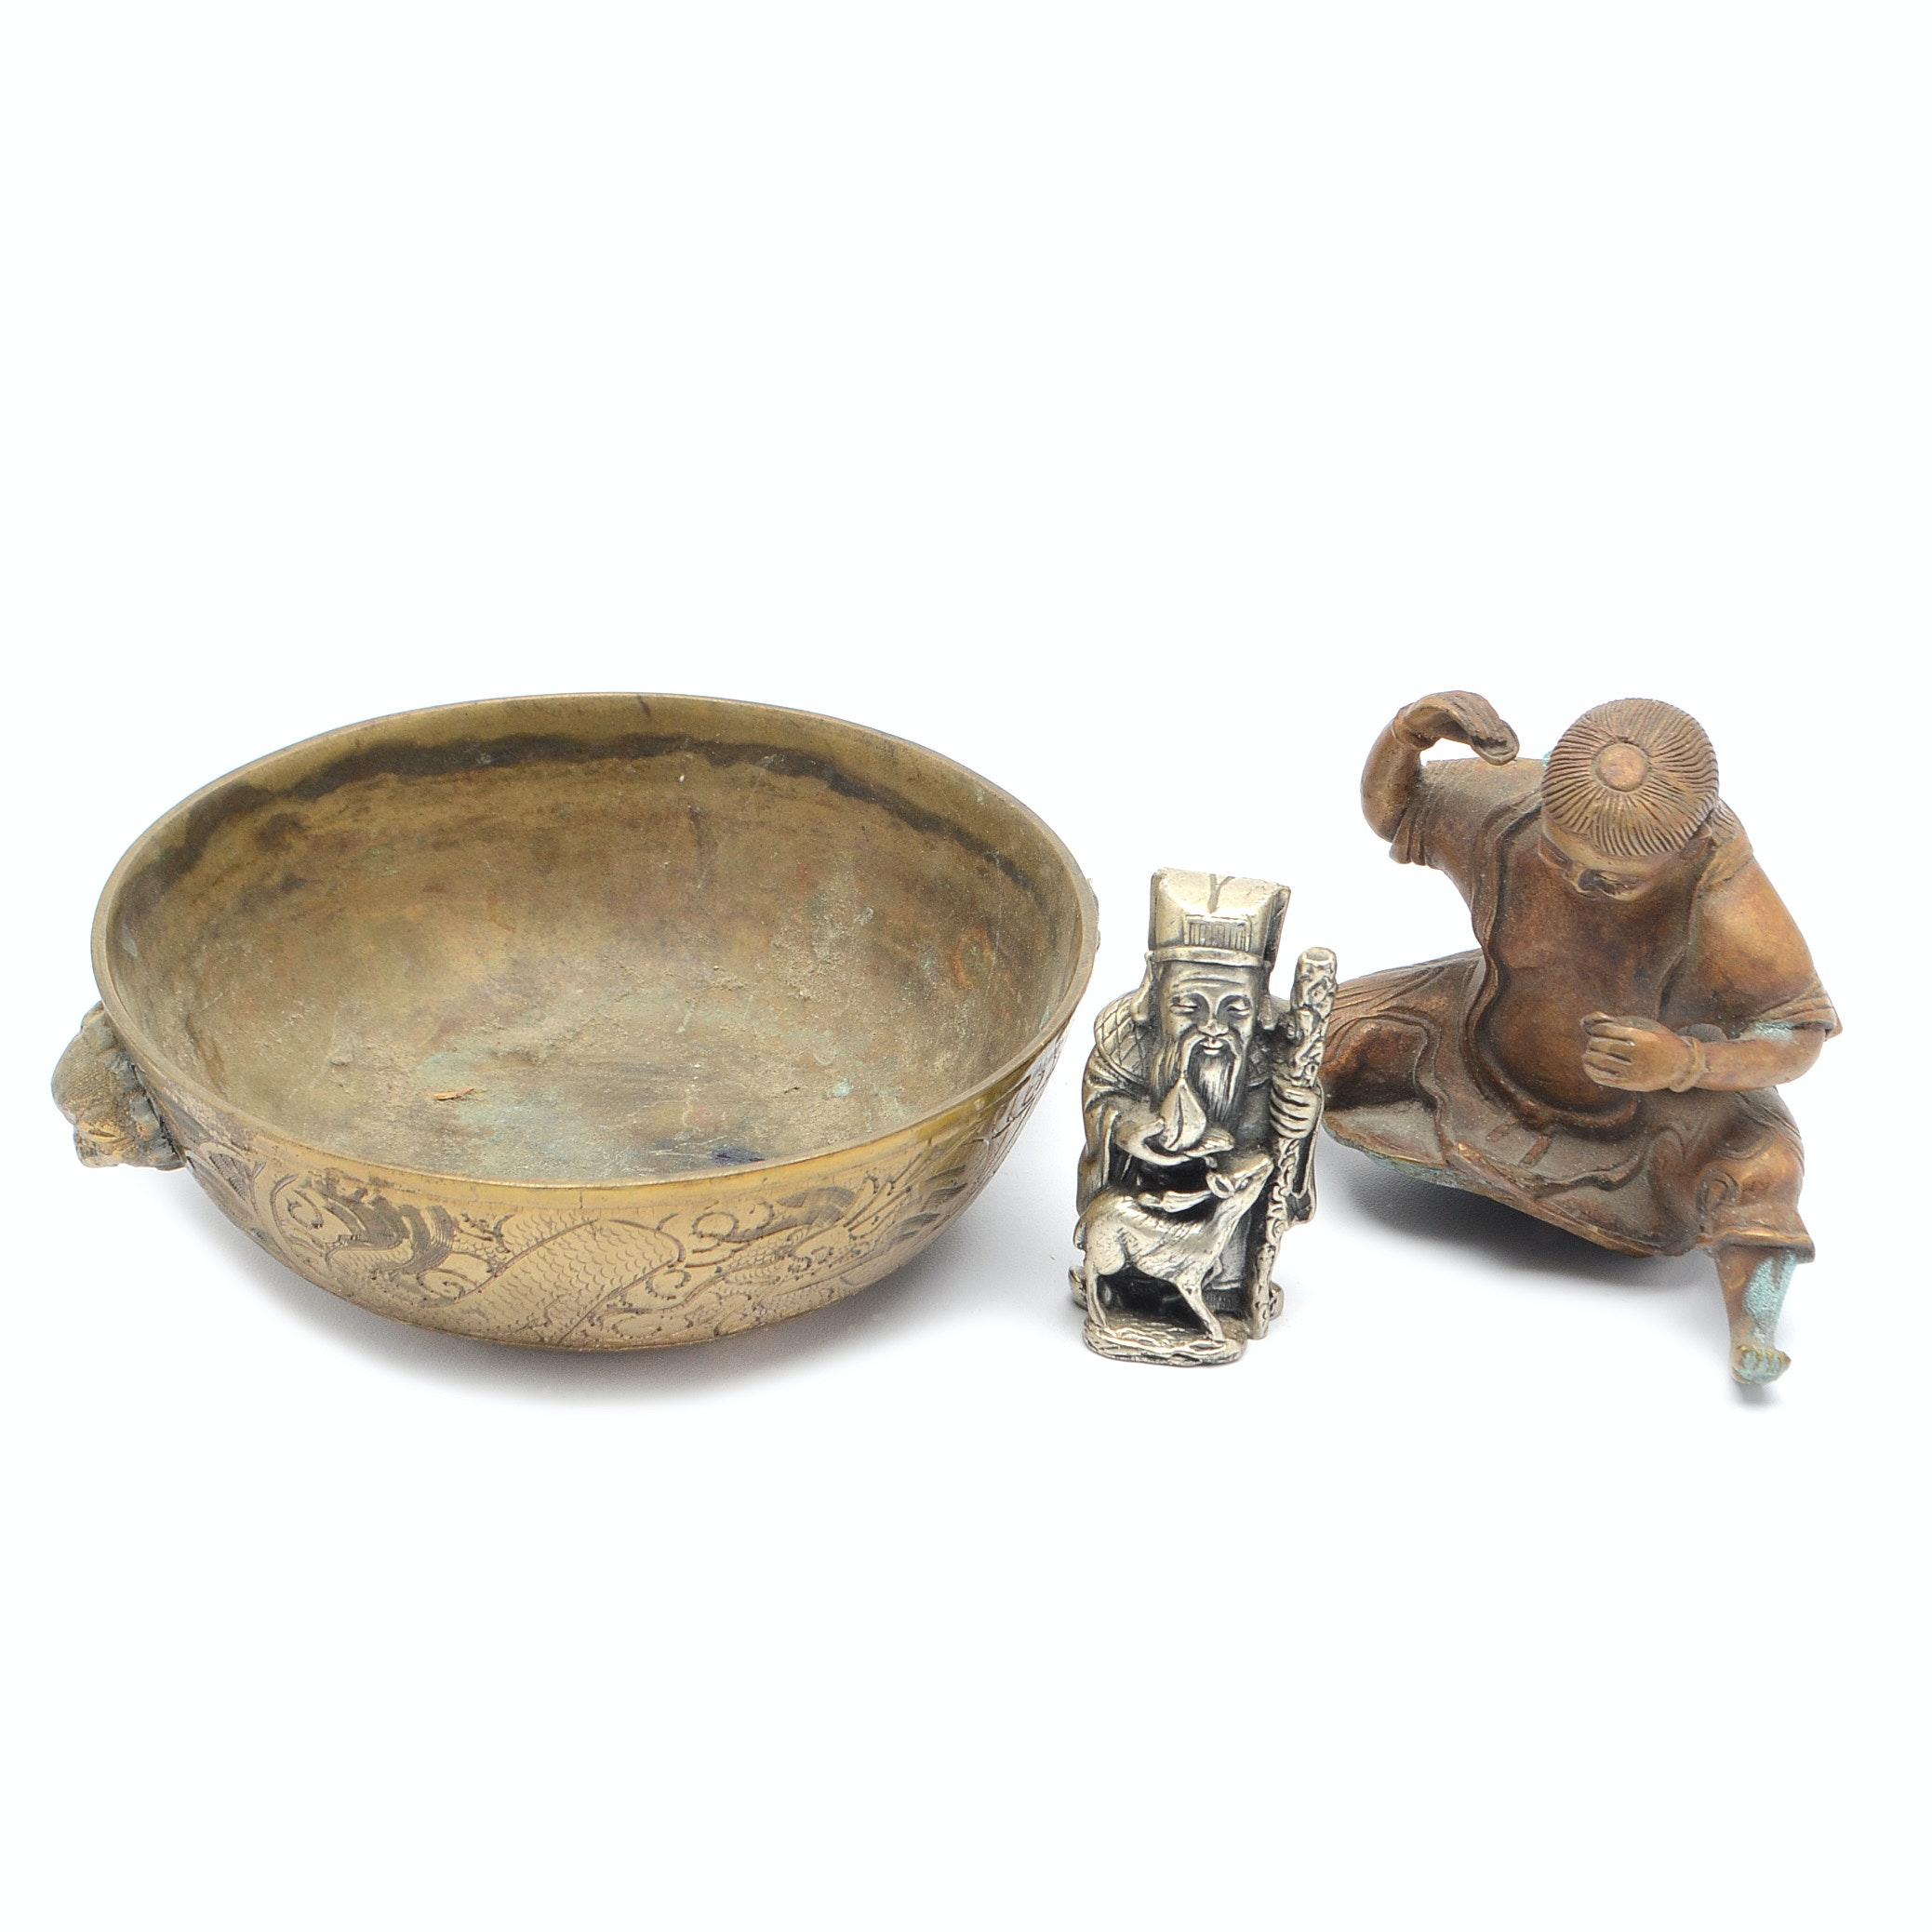 Decorative Figurines Featuring Peltro